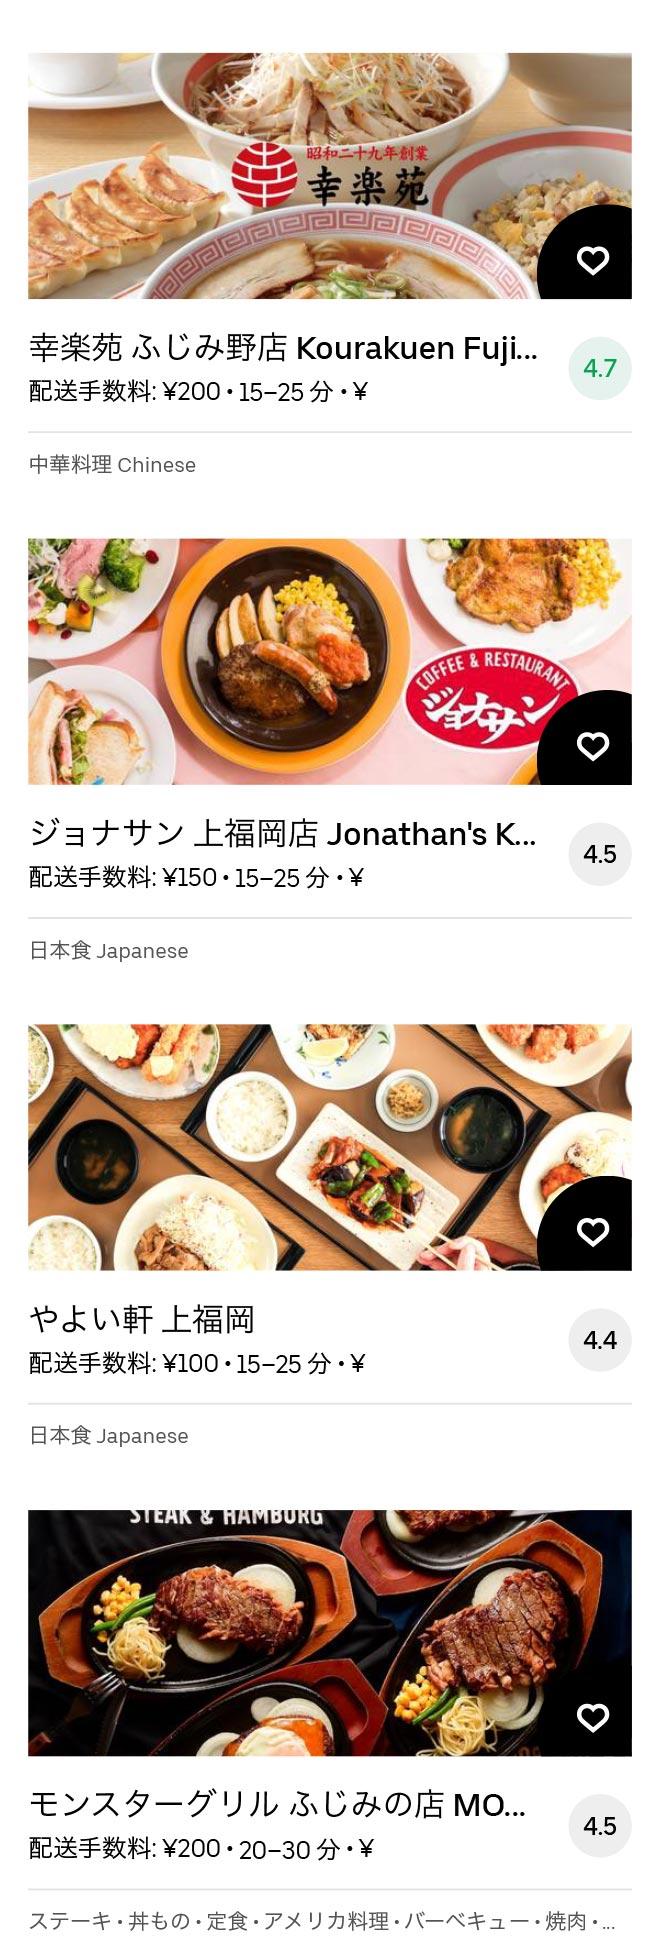 Kamifukuoka menu 2011 04